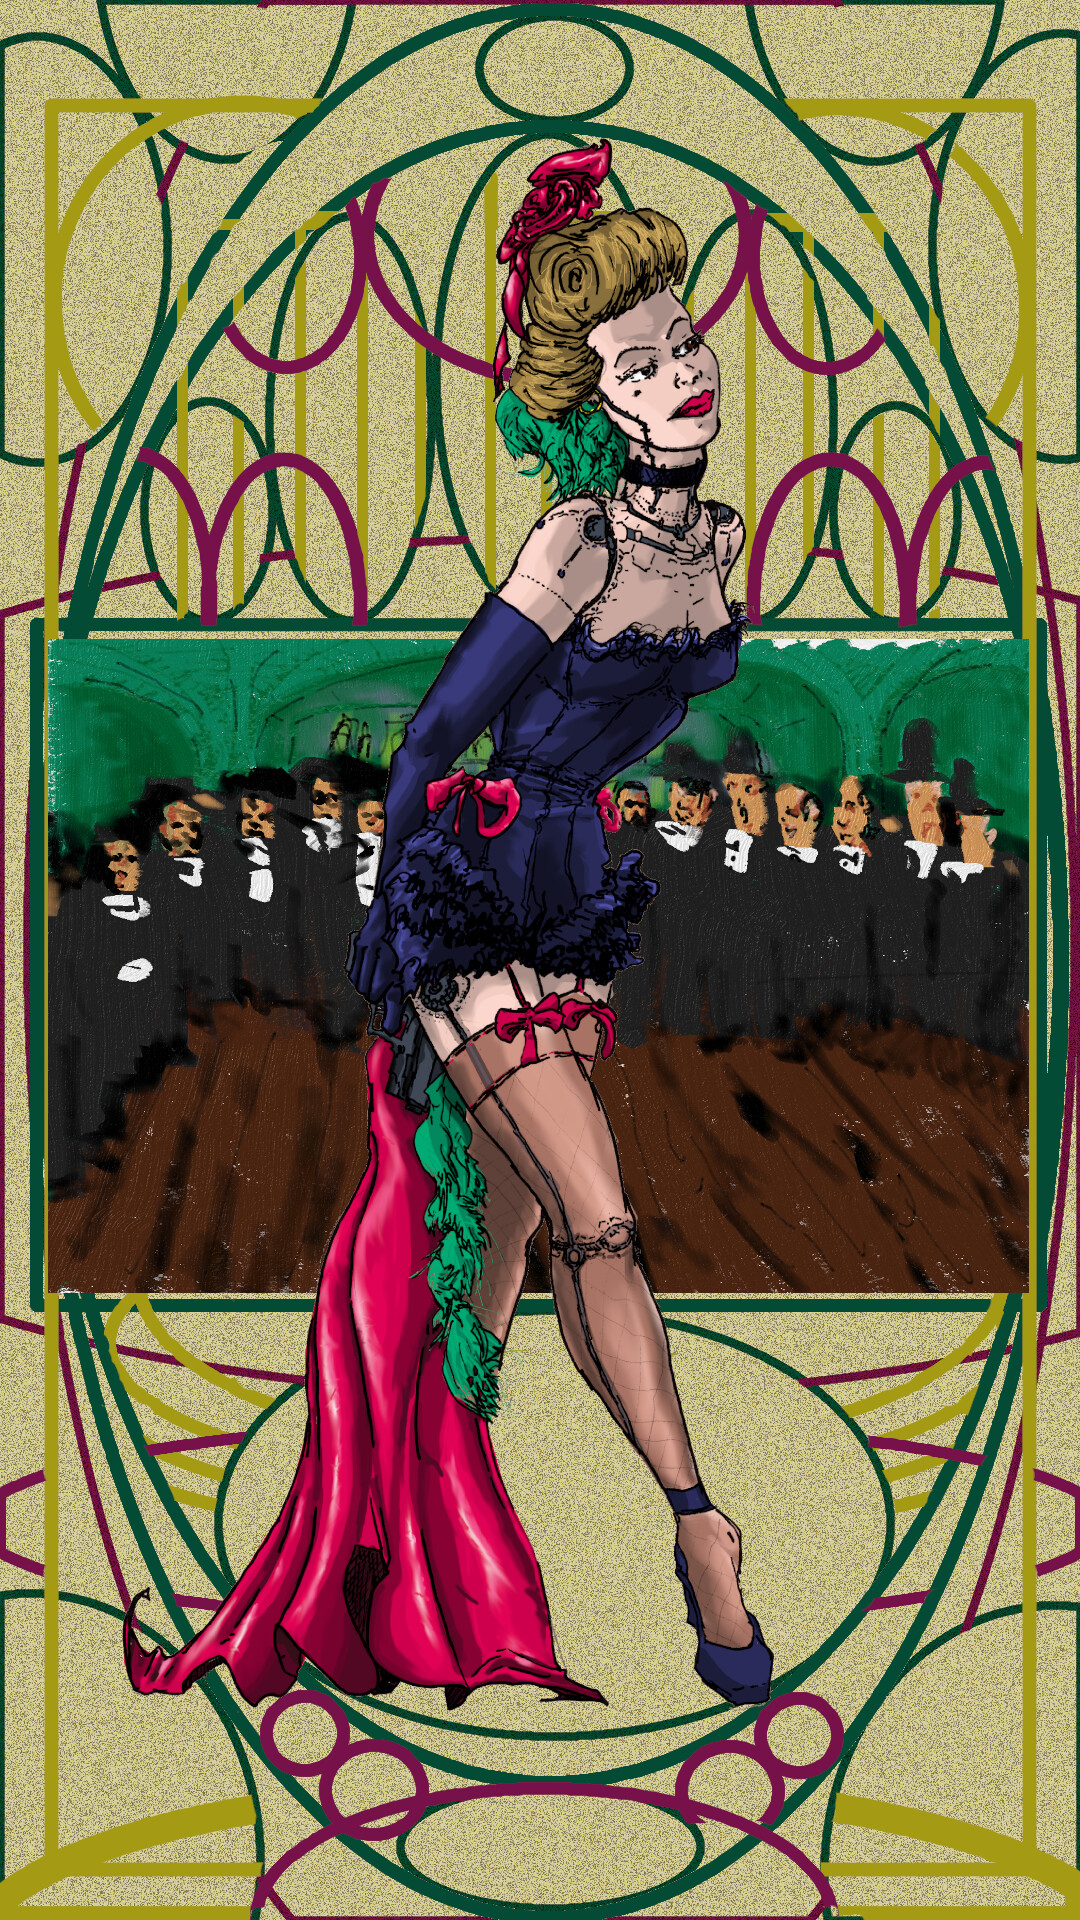 Cyborg Chorus Girl avec Toulouse-Lautrec